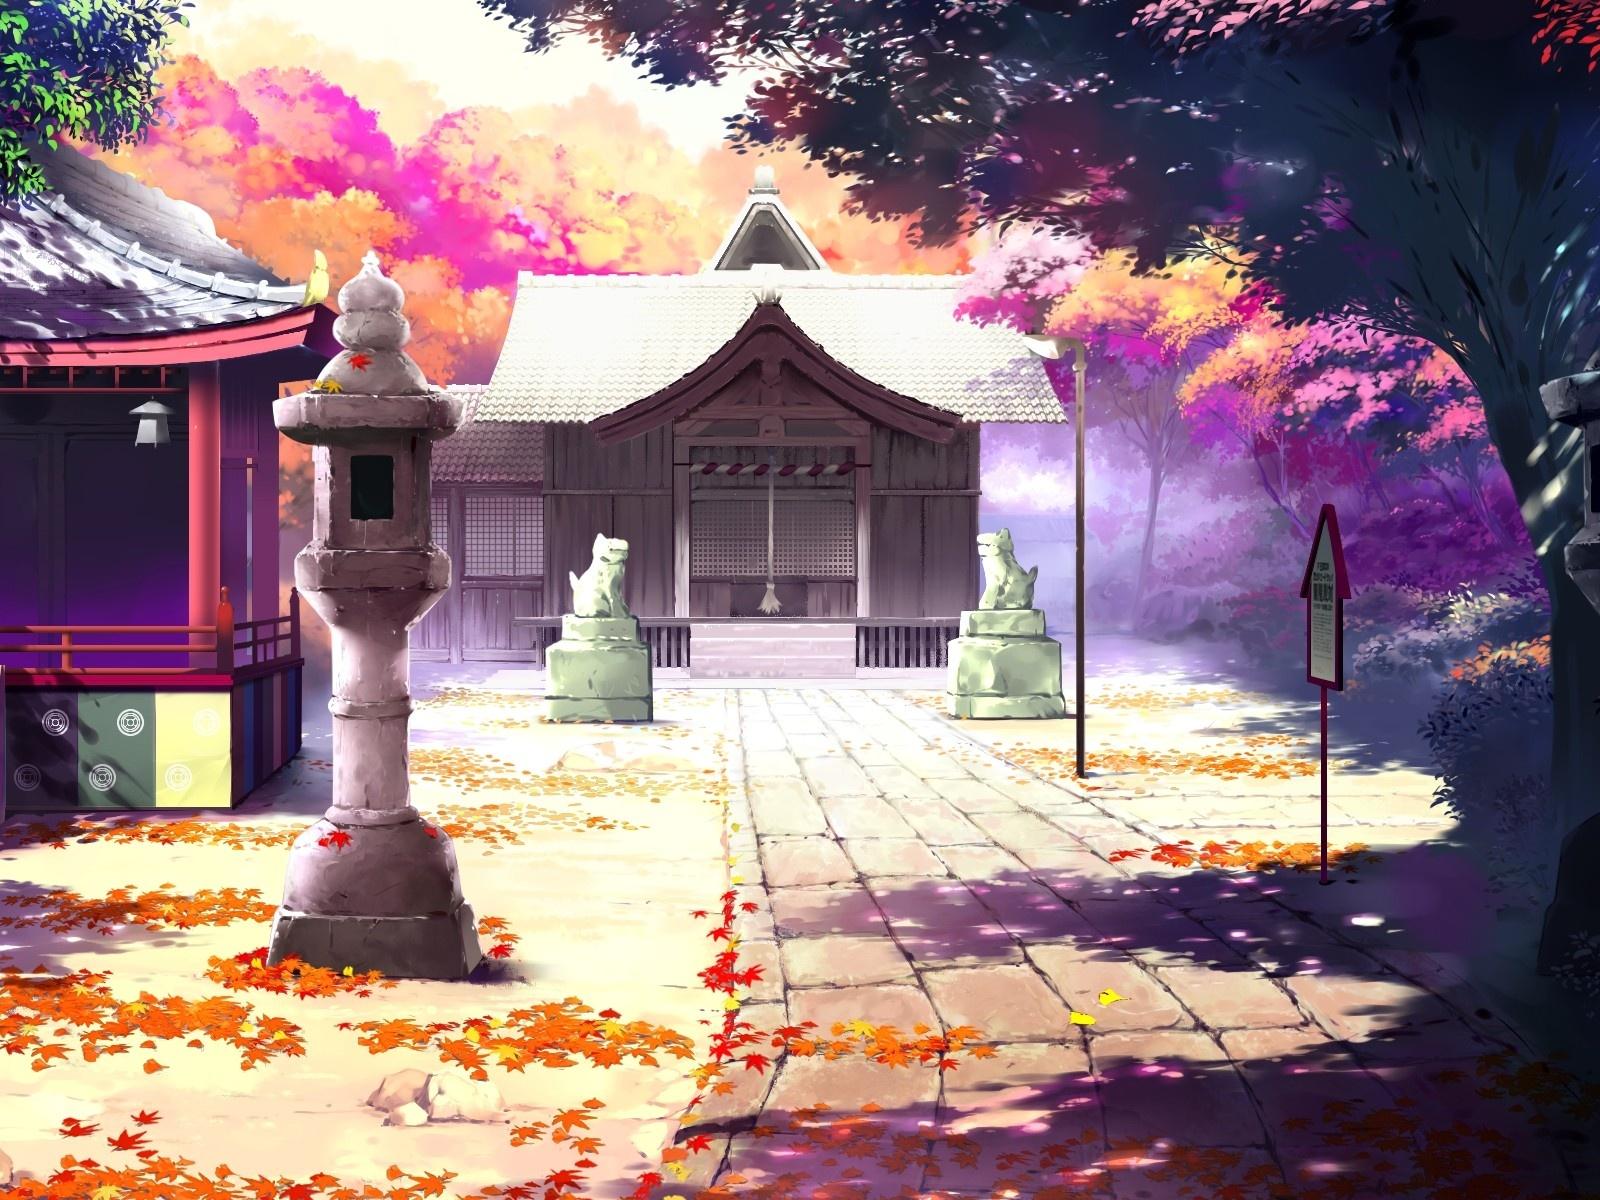 Hermoso paisaje animado, casas, otoño Fondos de pantalla | 1600x1200 ...: es.best-wallpaper.net/Beautiful-anime-scenery-houses-autumn...